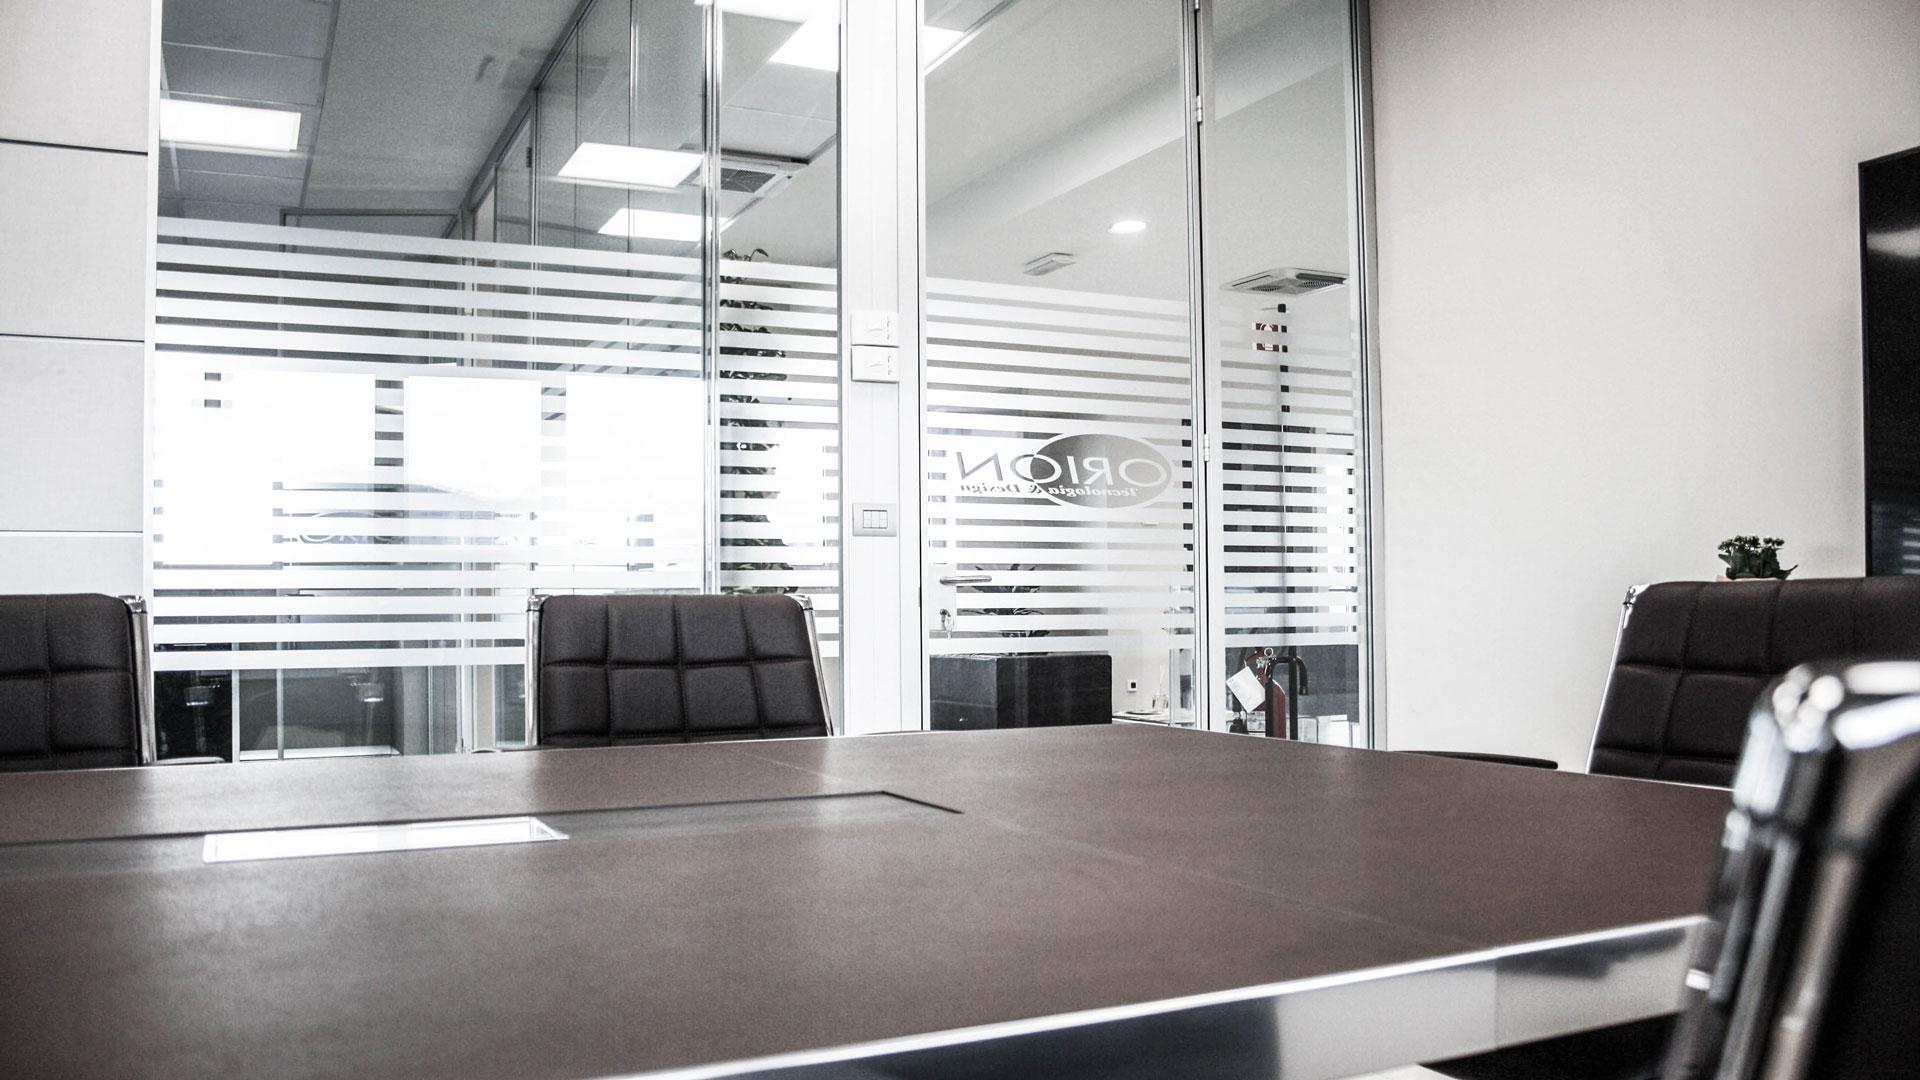 sala-riunioni-comp-1.jpg